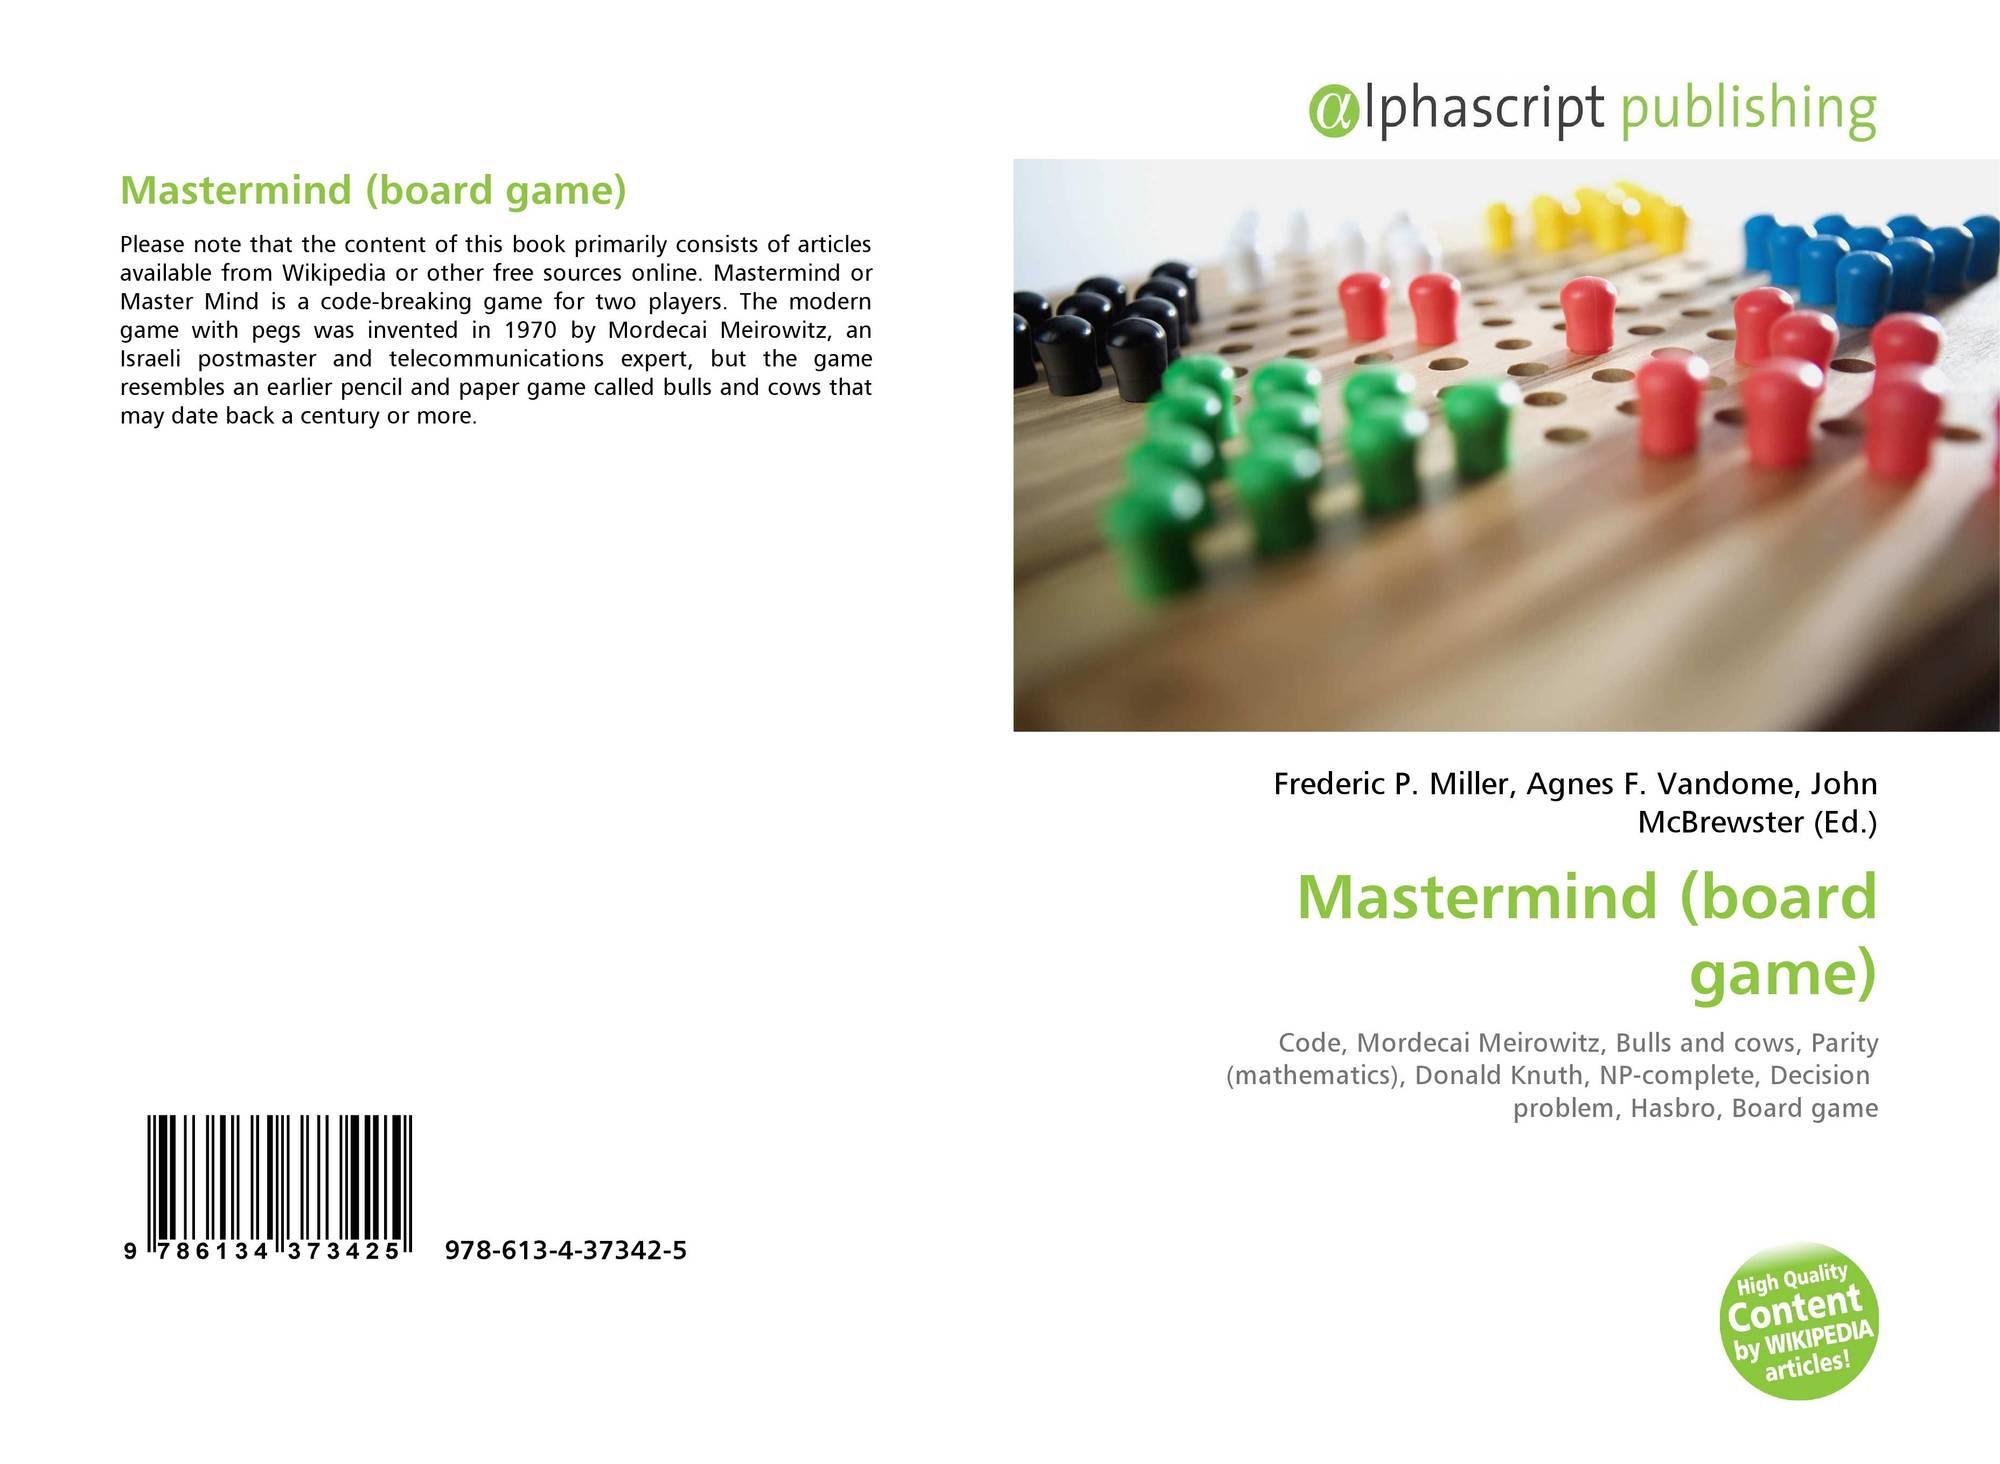 Board online mastermind game Play Mastermind